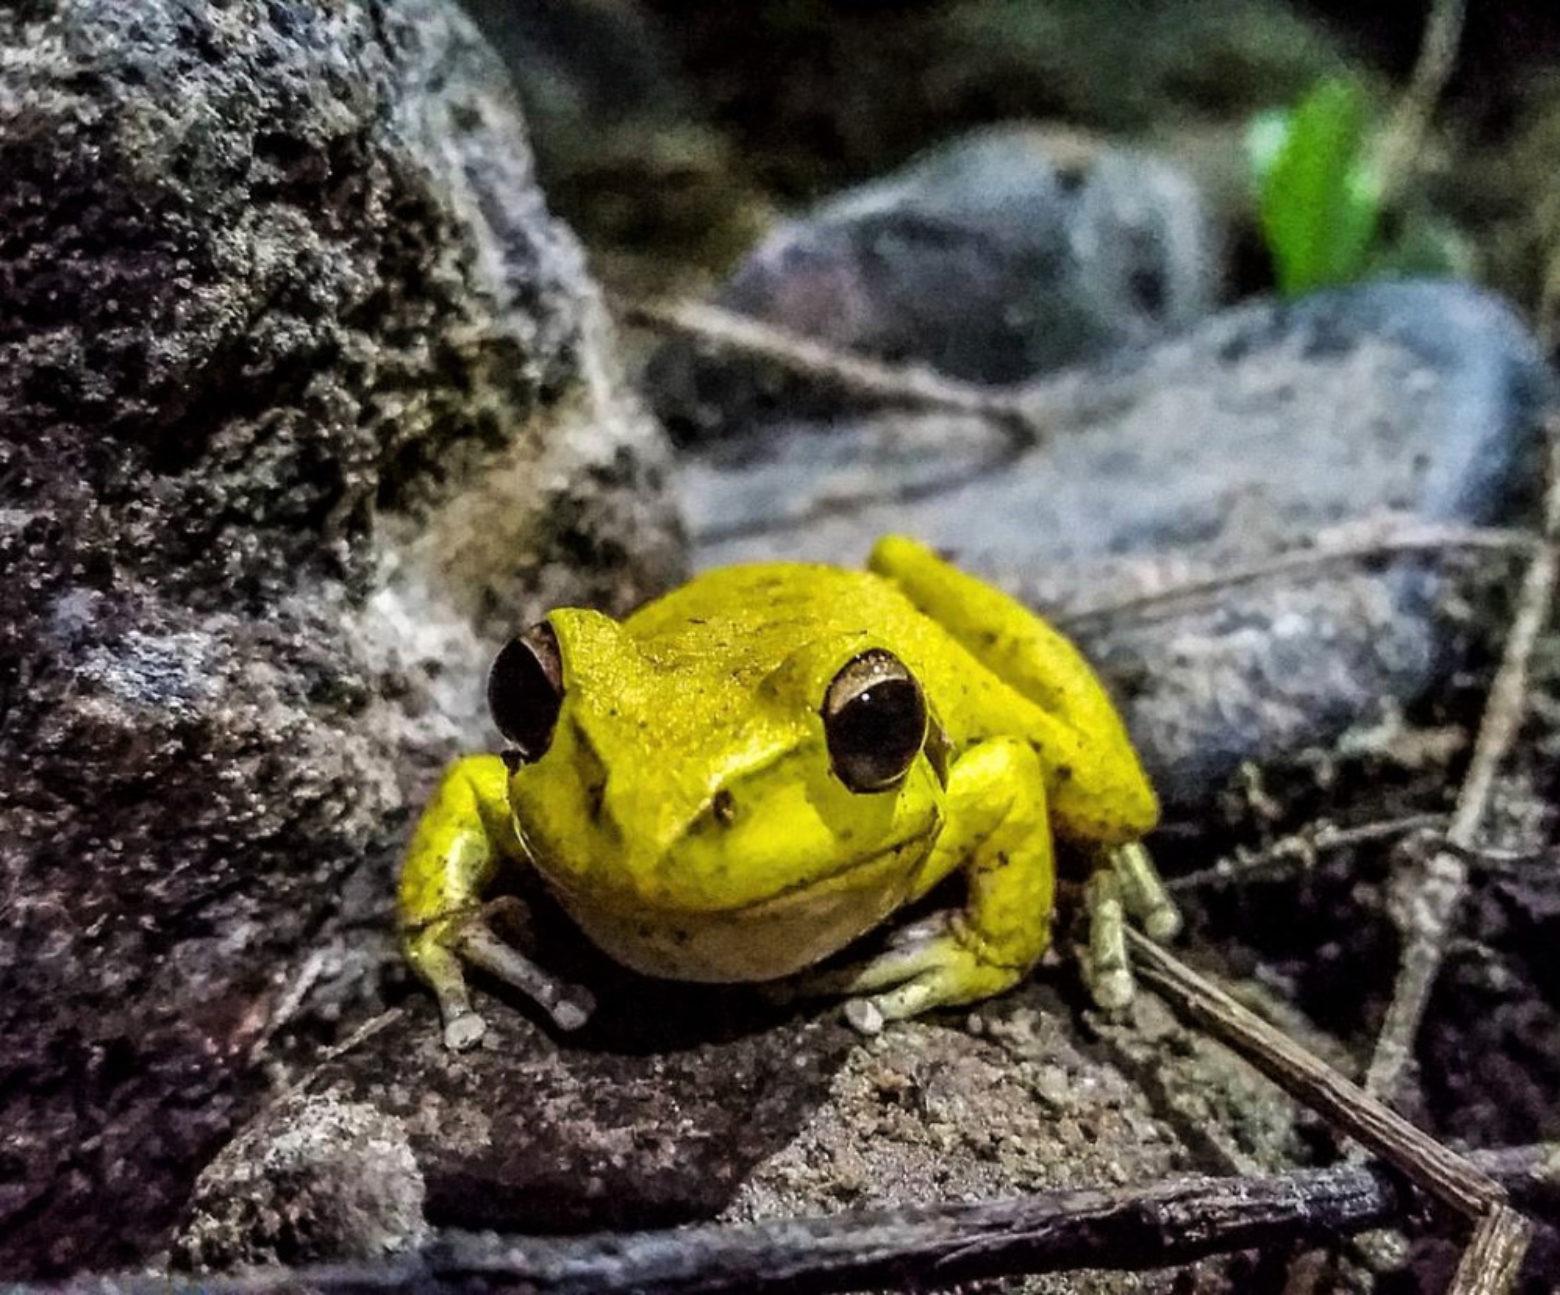 Eastern stony creek frog in Barrington Tops (photo by @albertpomeroy)